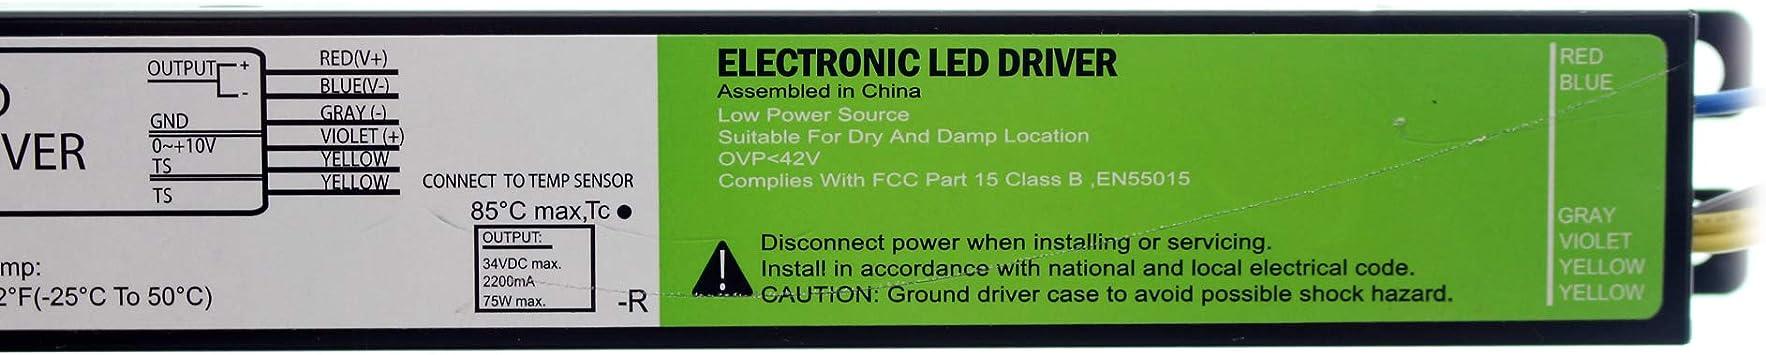 120//277V ACCUDRIVE PDM075W-2A2GE DIMMING LED DRIVER 34V @ 2200MA 75W 0-10V